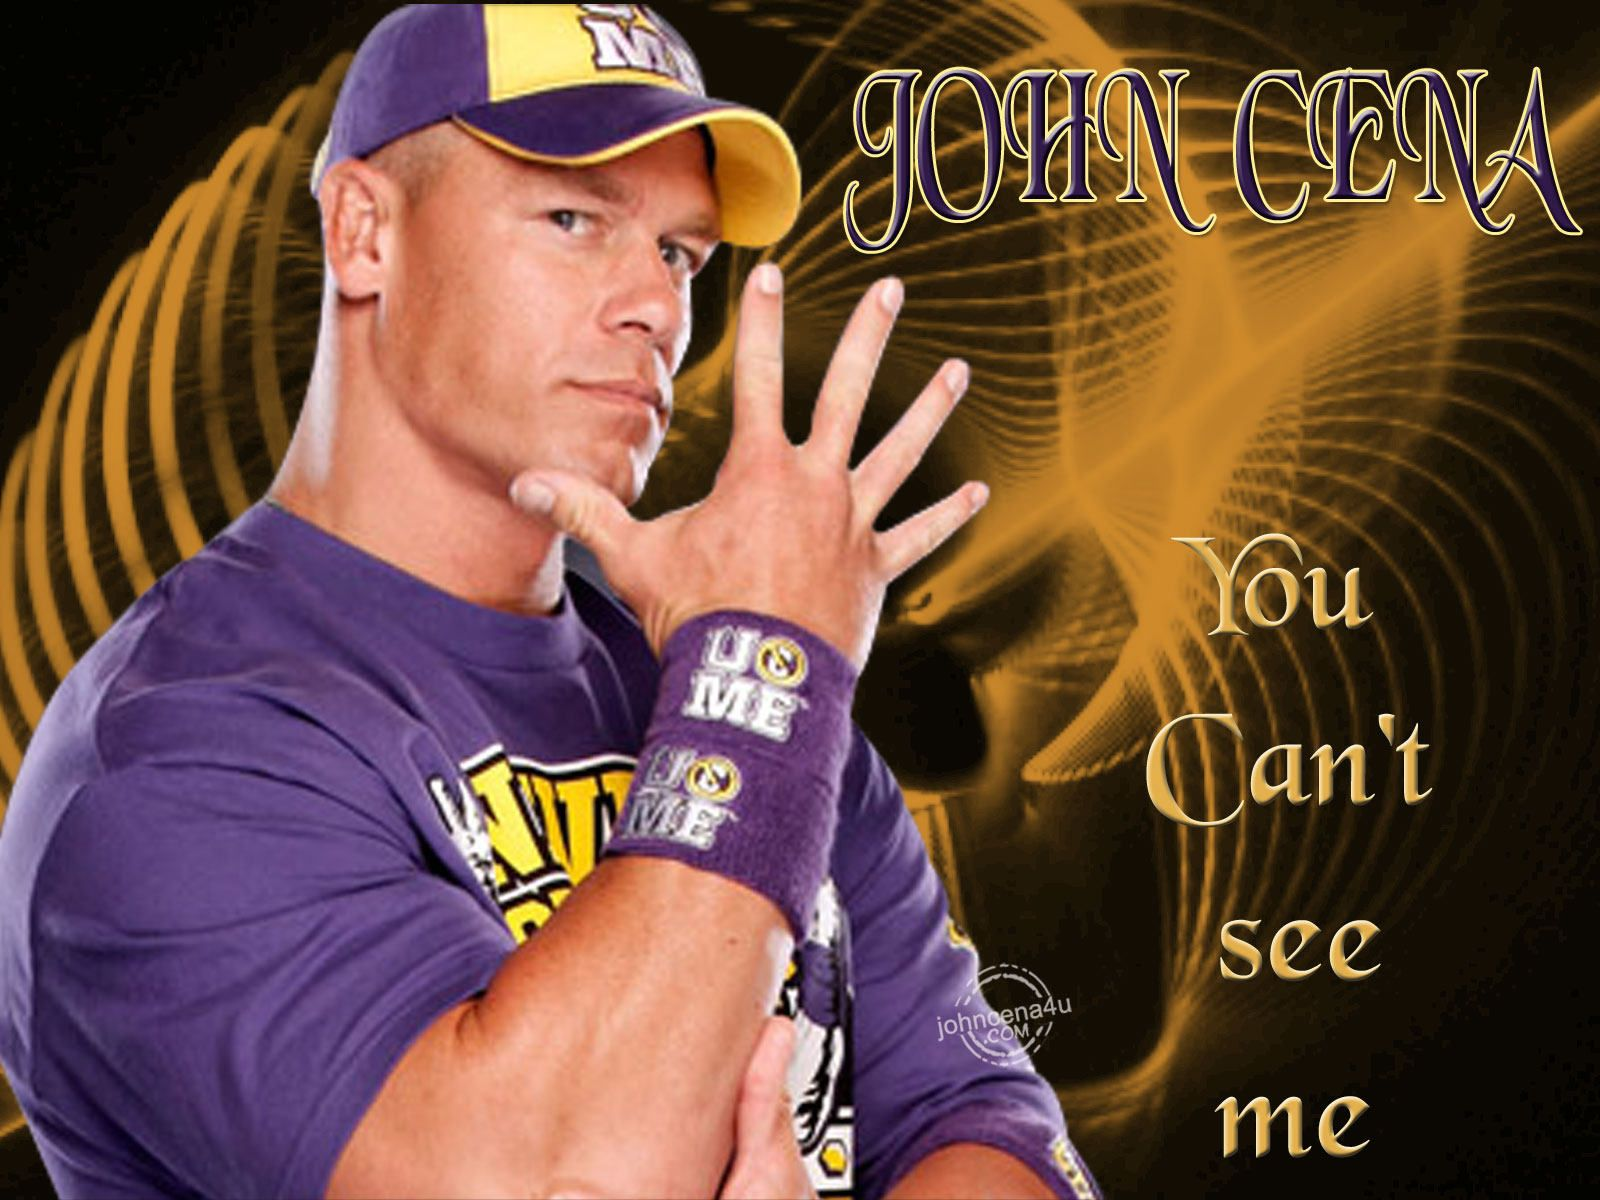 WWE Superstar John Cena Wallpaper HD Pictures One HD ...